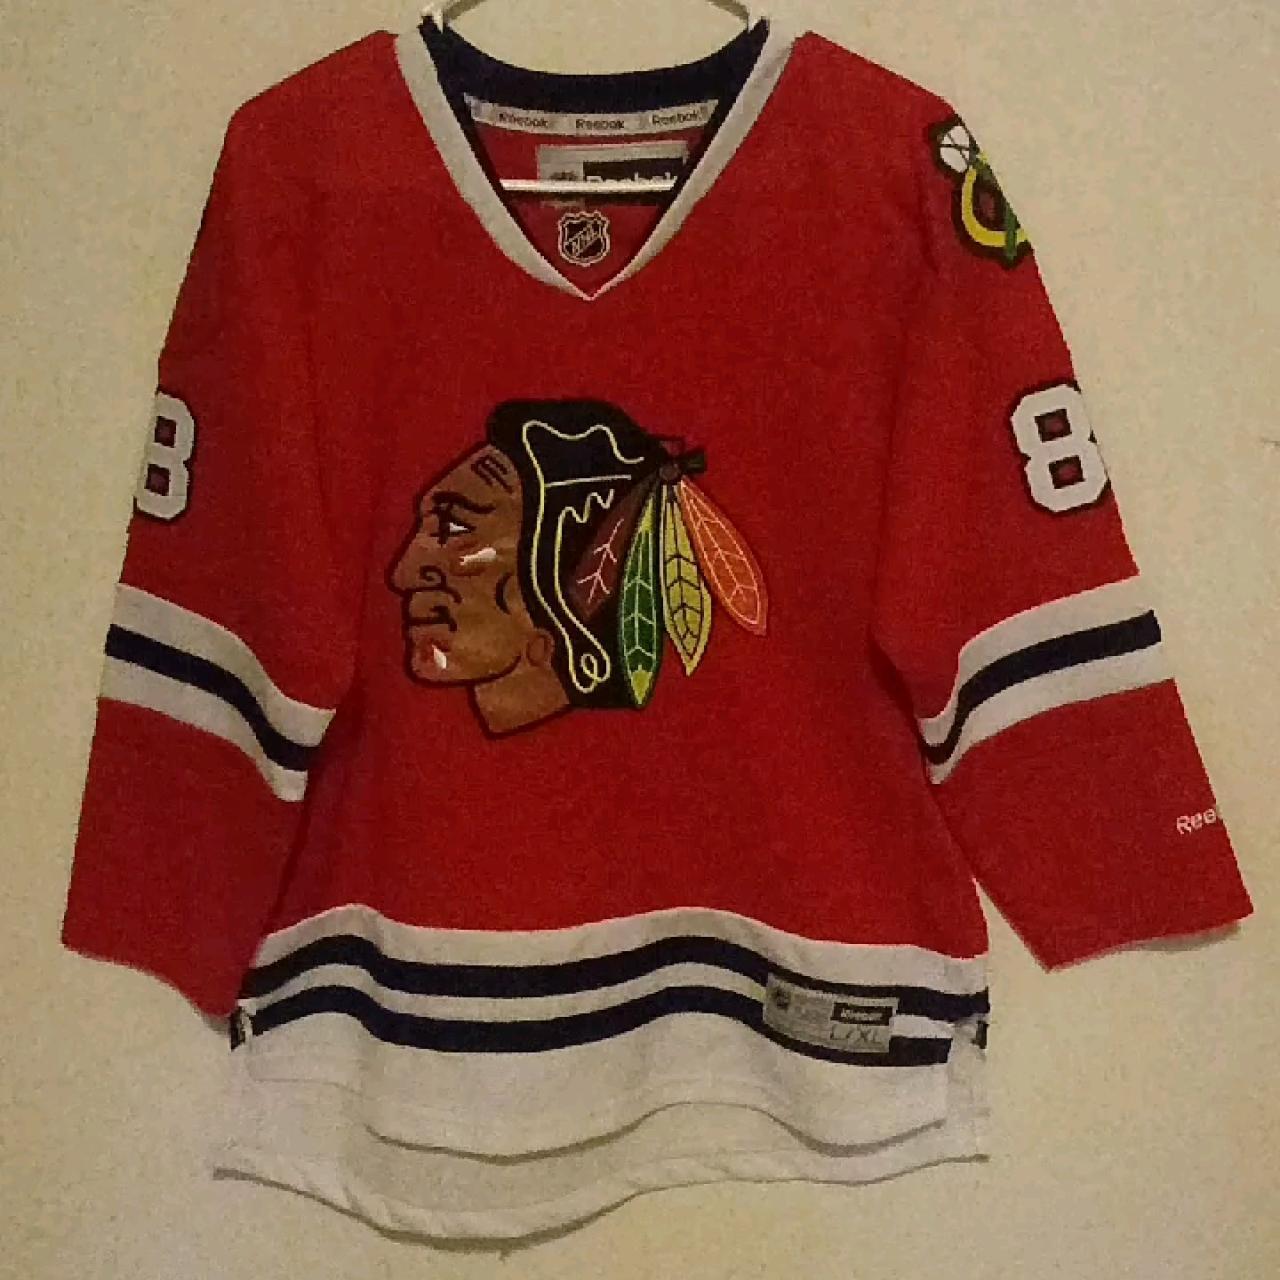 Blackhawk hockey jersey Reebok  Throwback  hypebeast Youth a - Depop 1fb4fd7e0